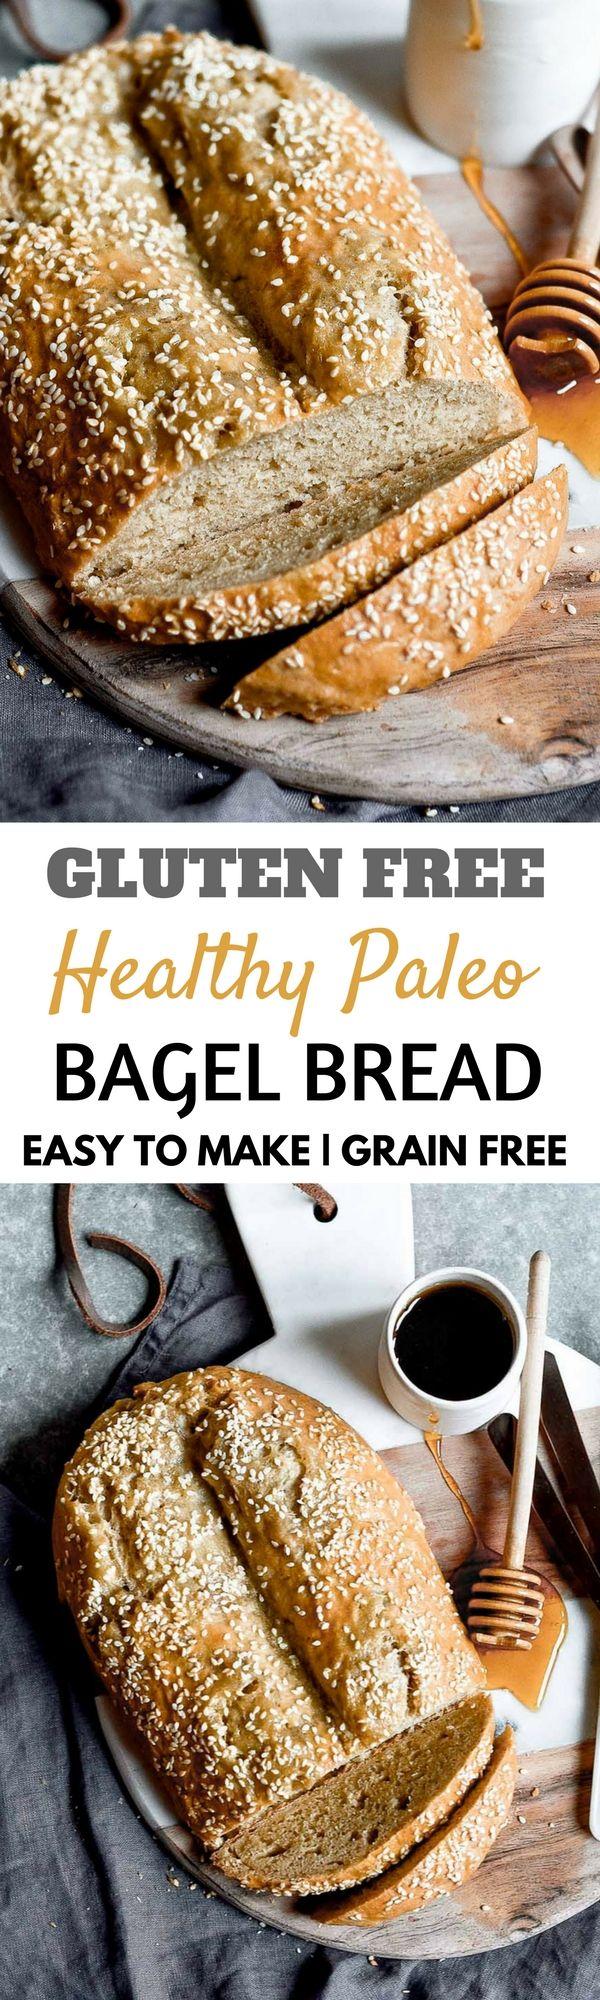 Healthy gluten free paleo bagel bread. An Easy to make grain free bread that tastes like a bagel!